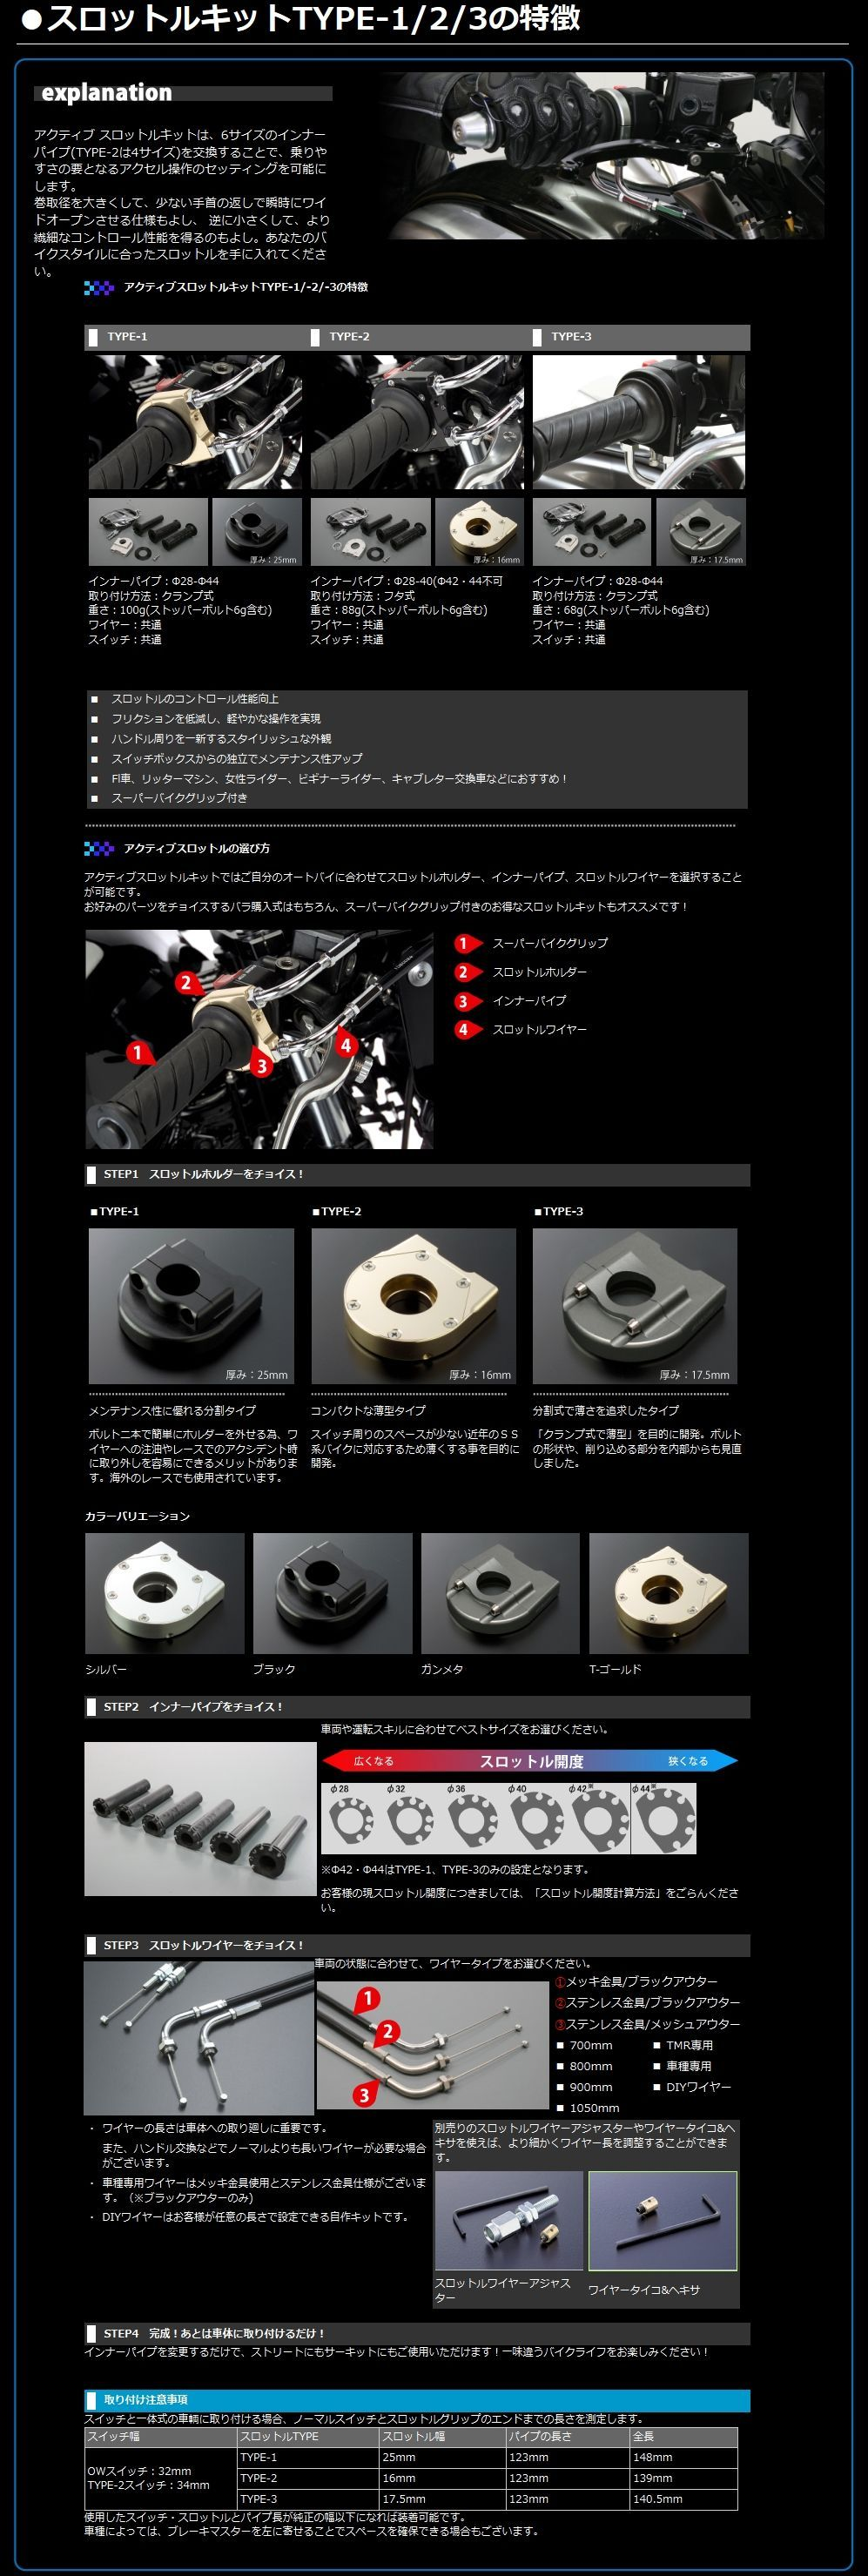 【ACTIVE】Type-2 快速油門組 (車種專用) - 「Webike-摩托百貨」